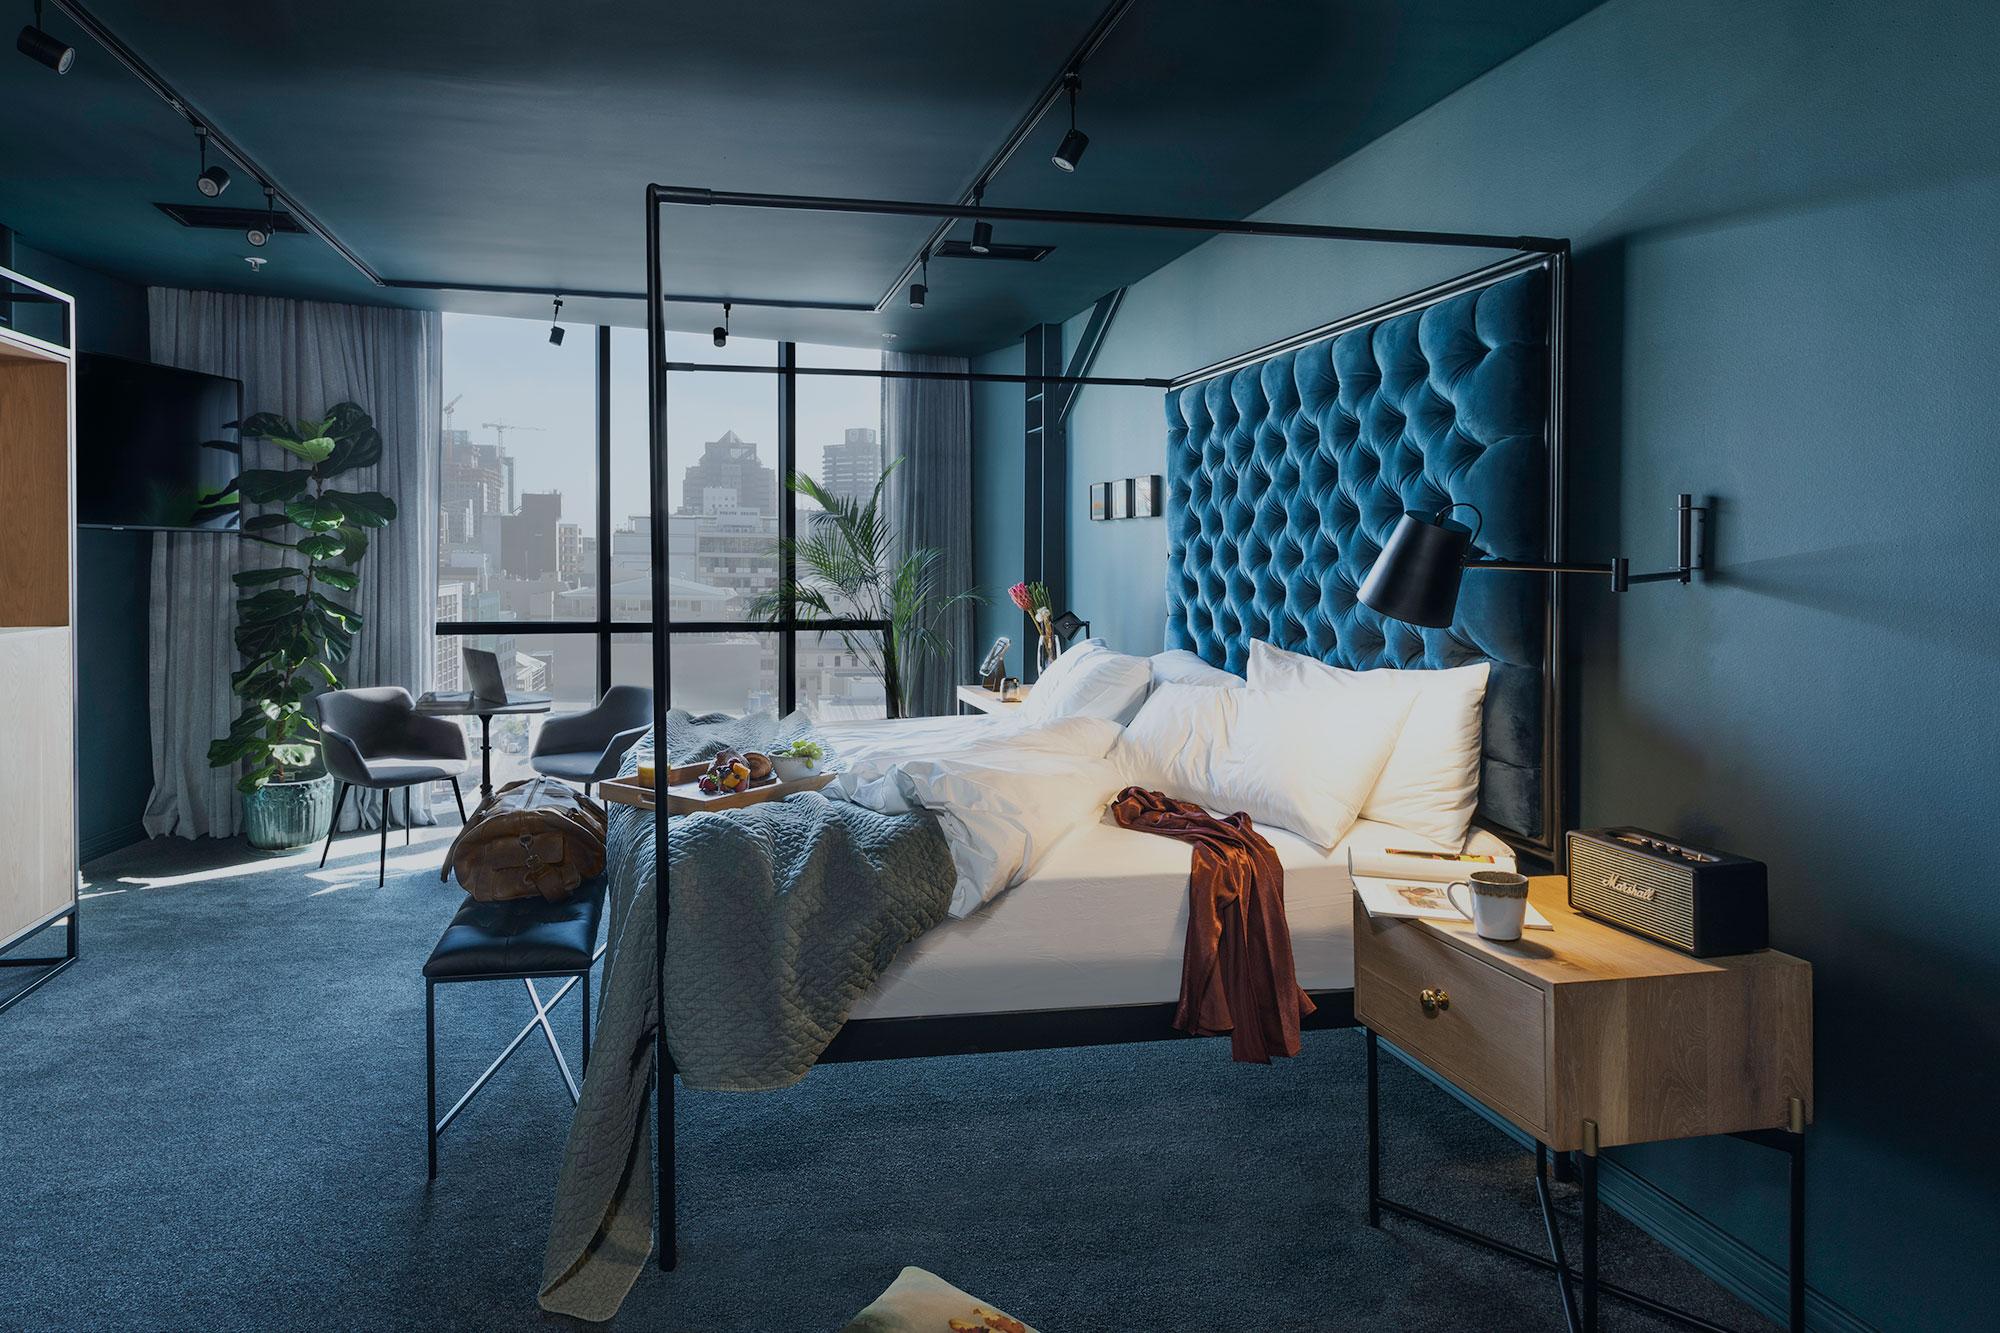 Cartel House Hotel boutique luxury bedroom